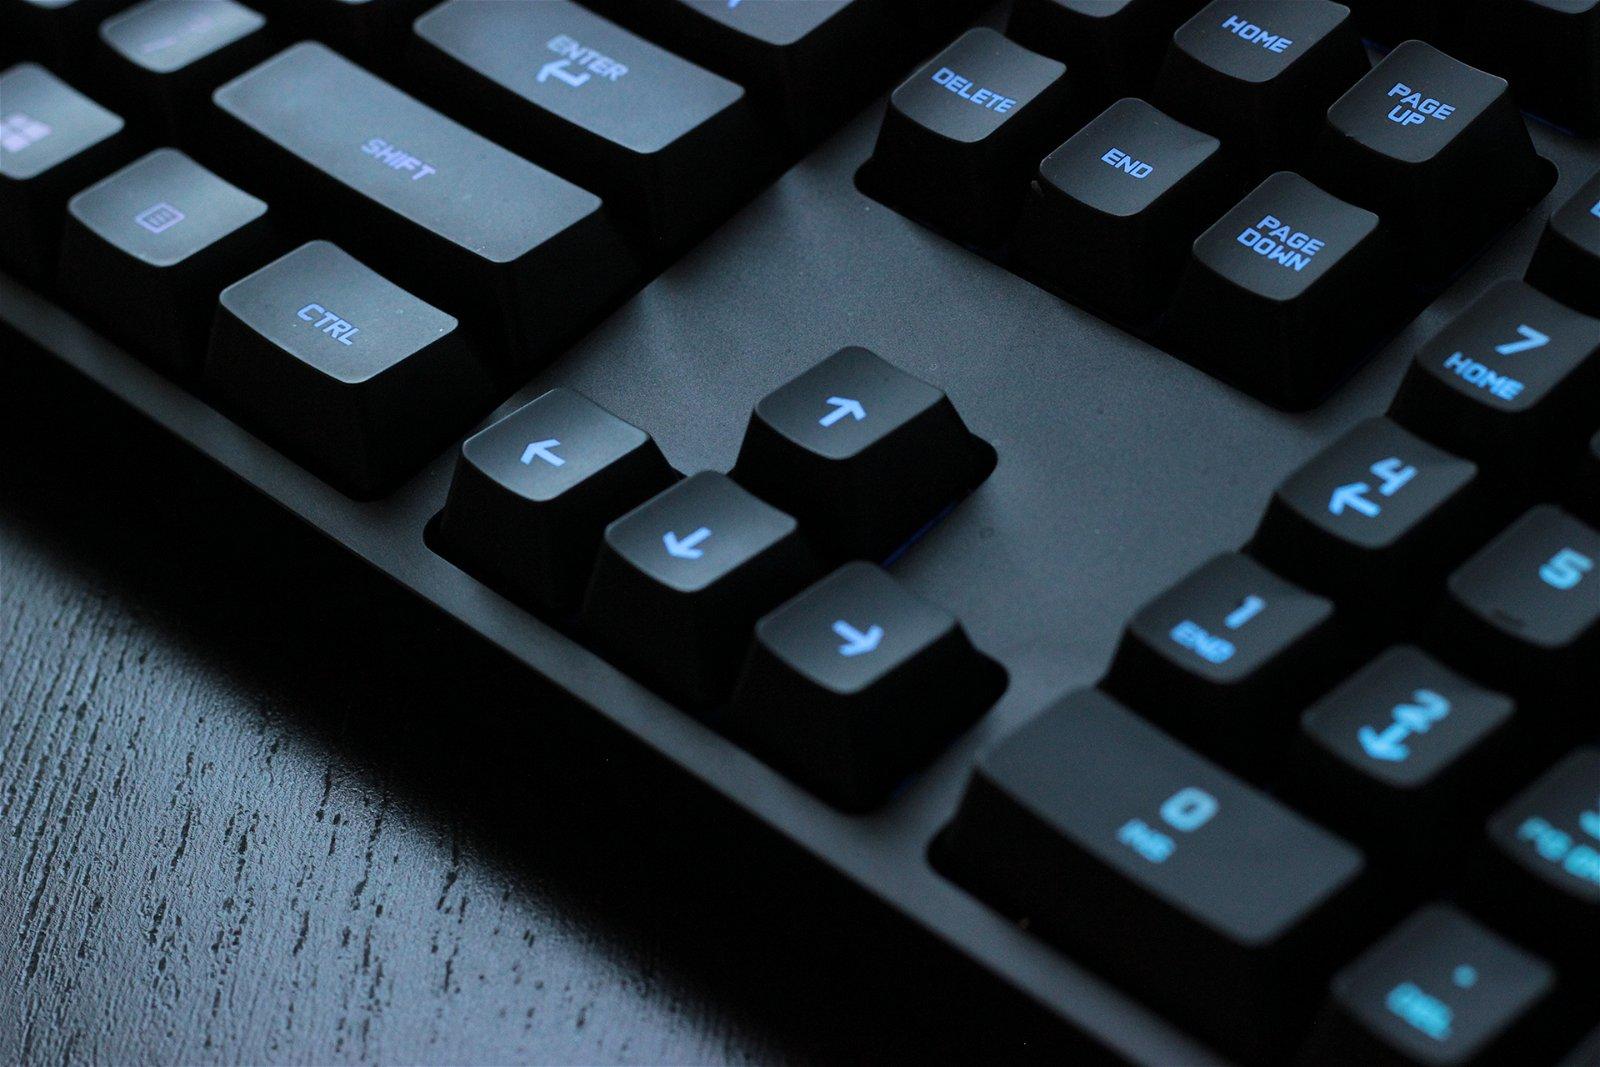 Logitech G810 Orion Spectrum Mechanical Keyboard Review 2